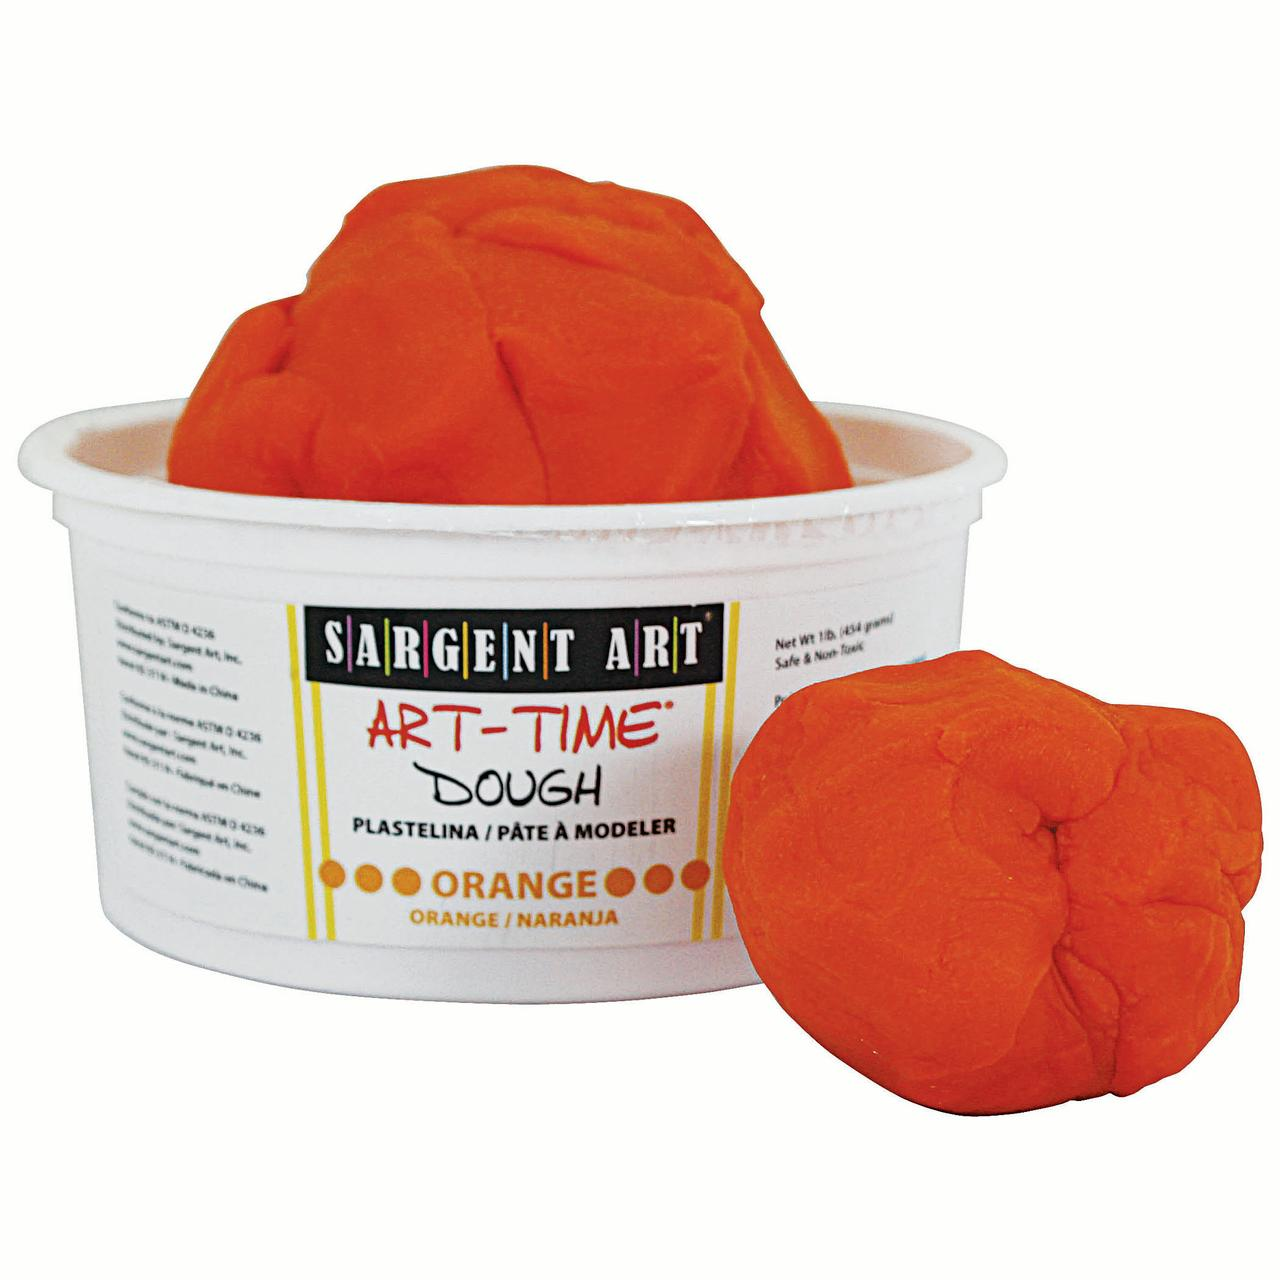 Art-Time® Dough, Orange, 1lb Tub, Pack of 6